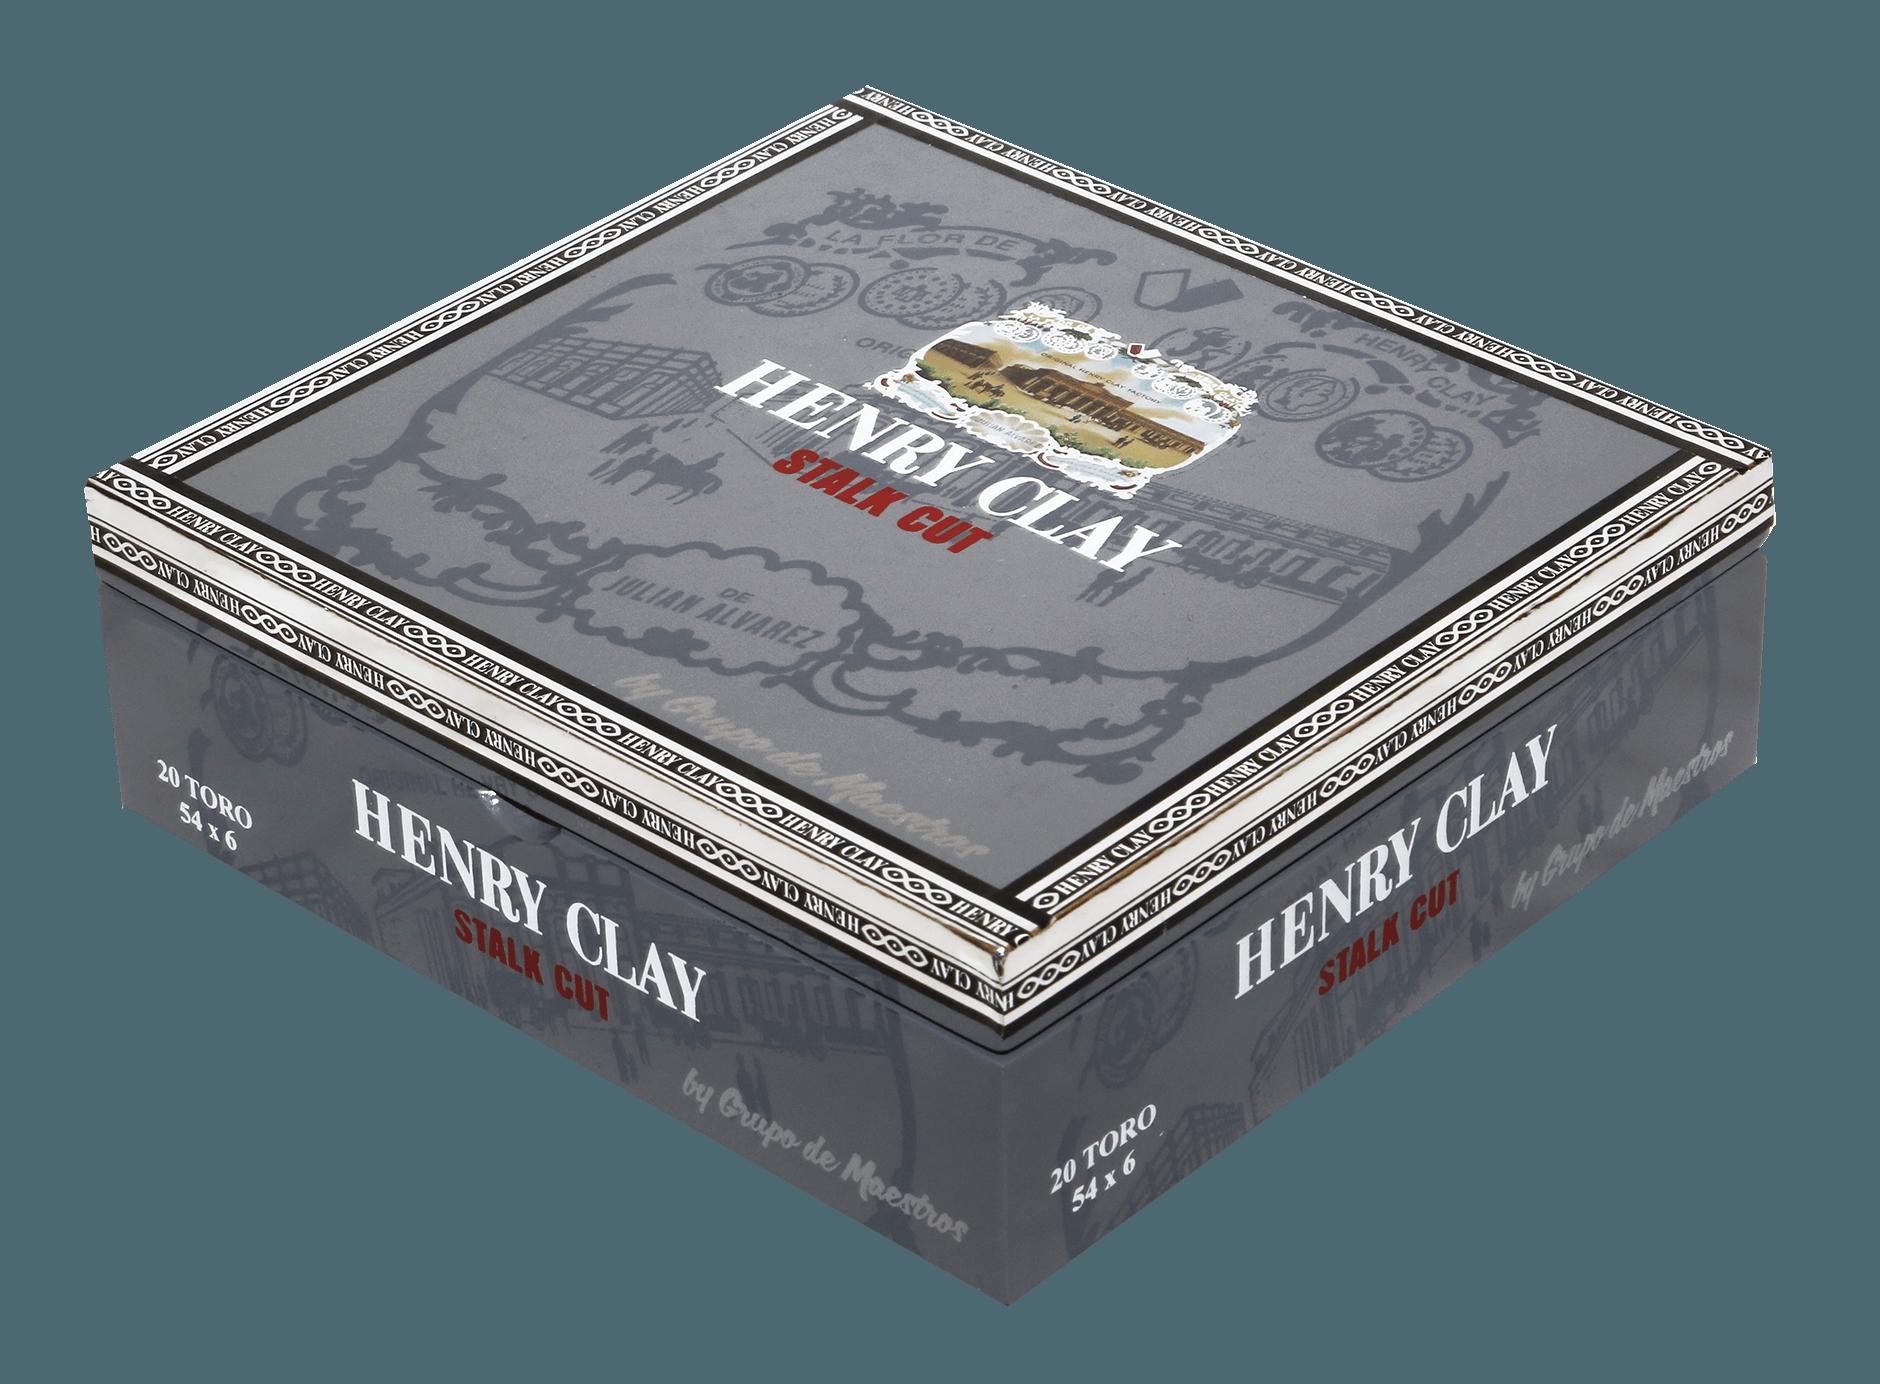 Henry Clay Stalk Cut closed_box_left